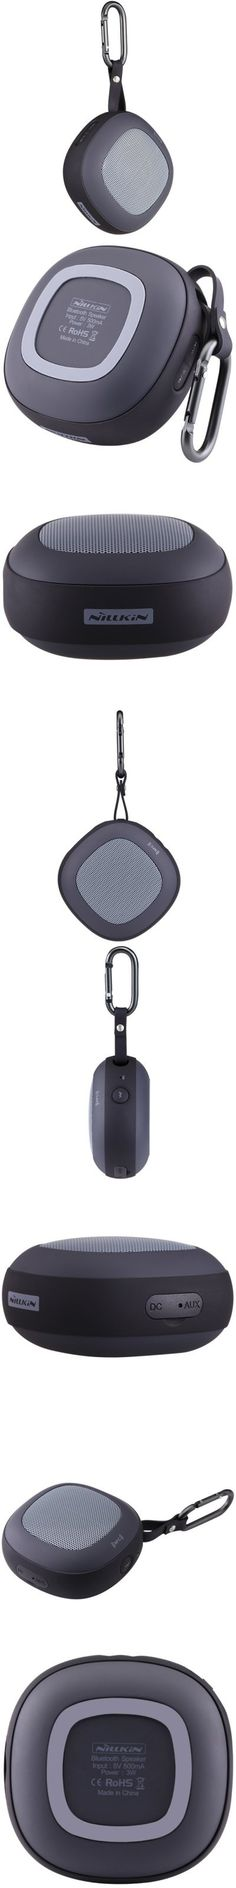 iPhone Speakers   Nillkin Mini Bluetooth Speaker